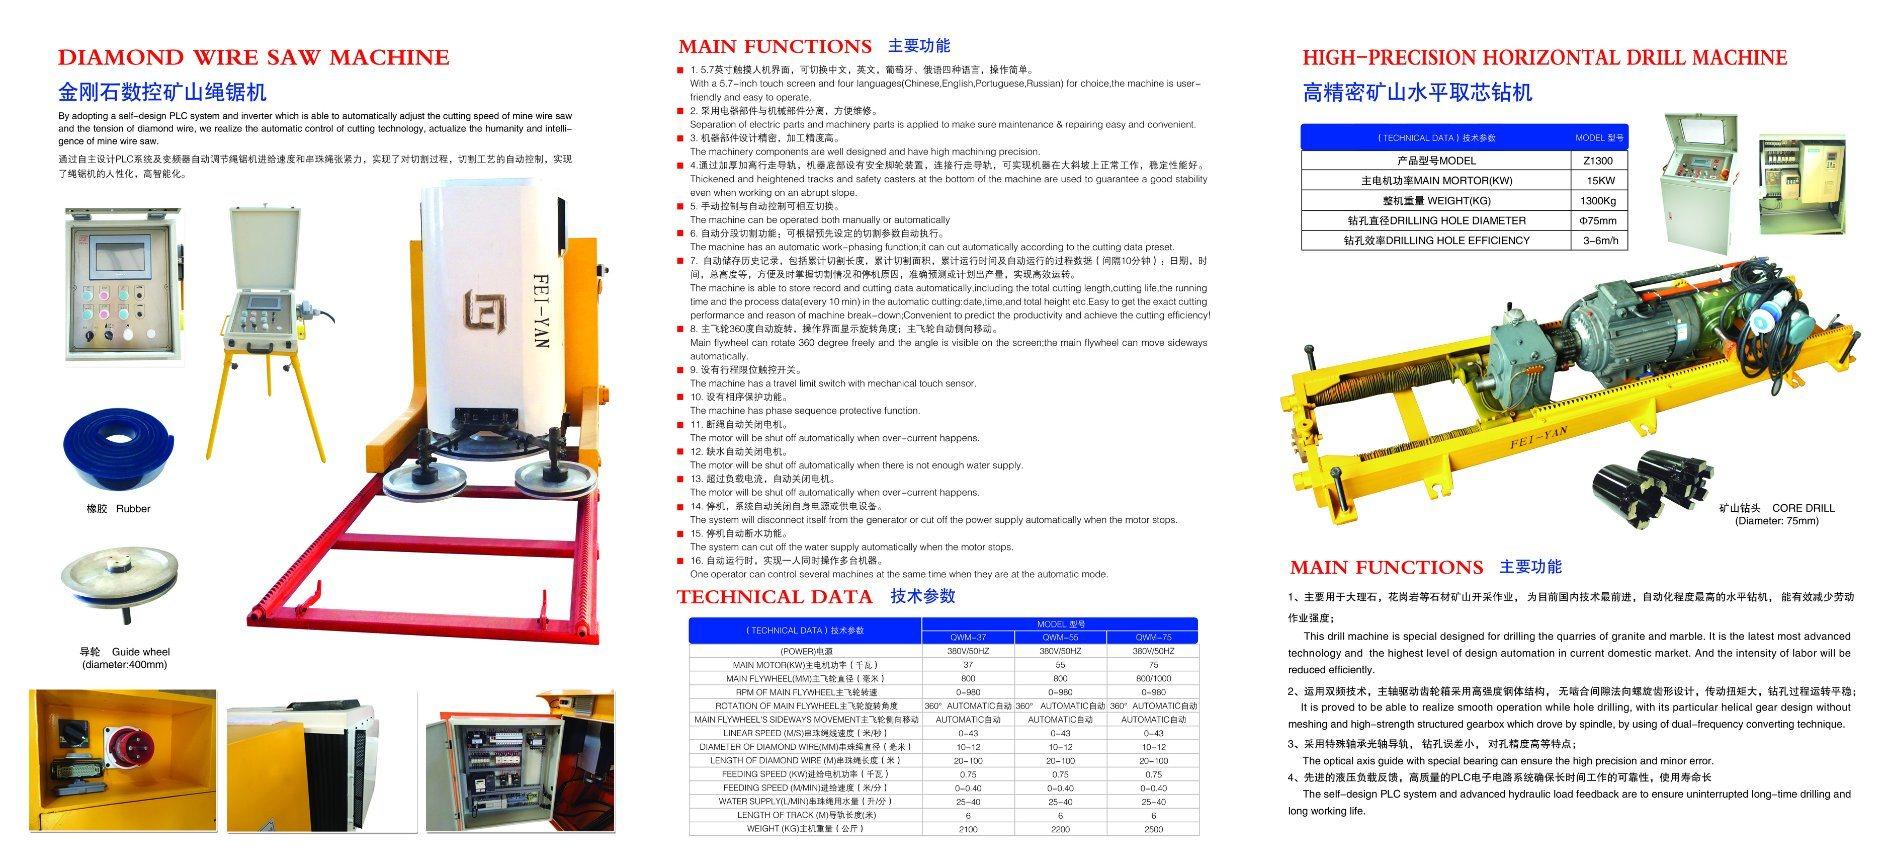 Diamond Wire Saw Machine for Stone/Granite - China Diamond Wire Saw ...